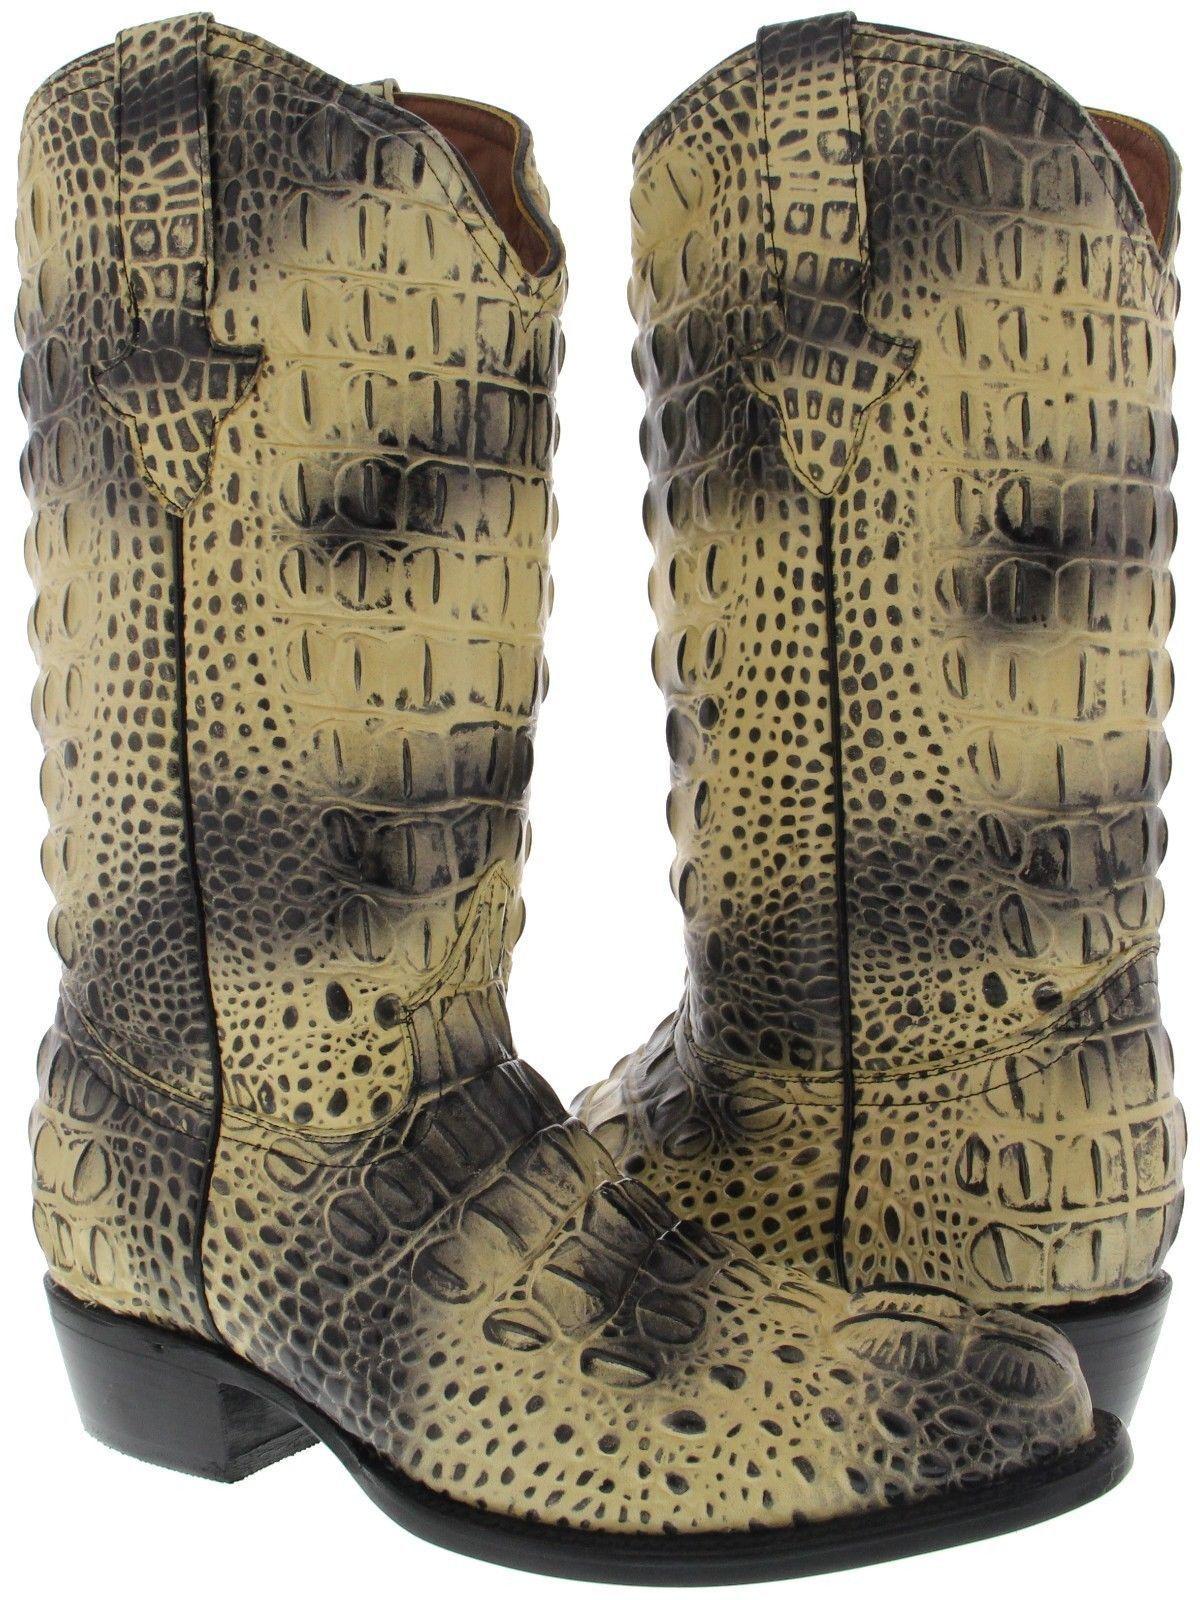 ba3393d70c490 Men's Multi color Full Crocodile Head Cut Print Leather Cowboy Boots Round  Toe. Merrell Men's BERNER Shift Lace Fashion Sneaker Events